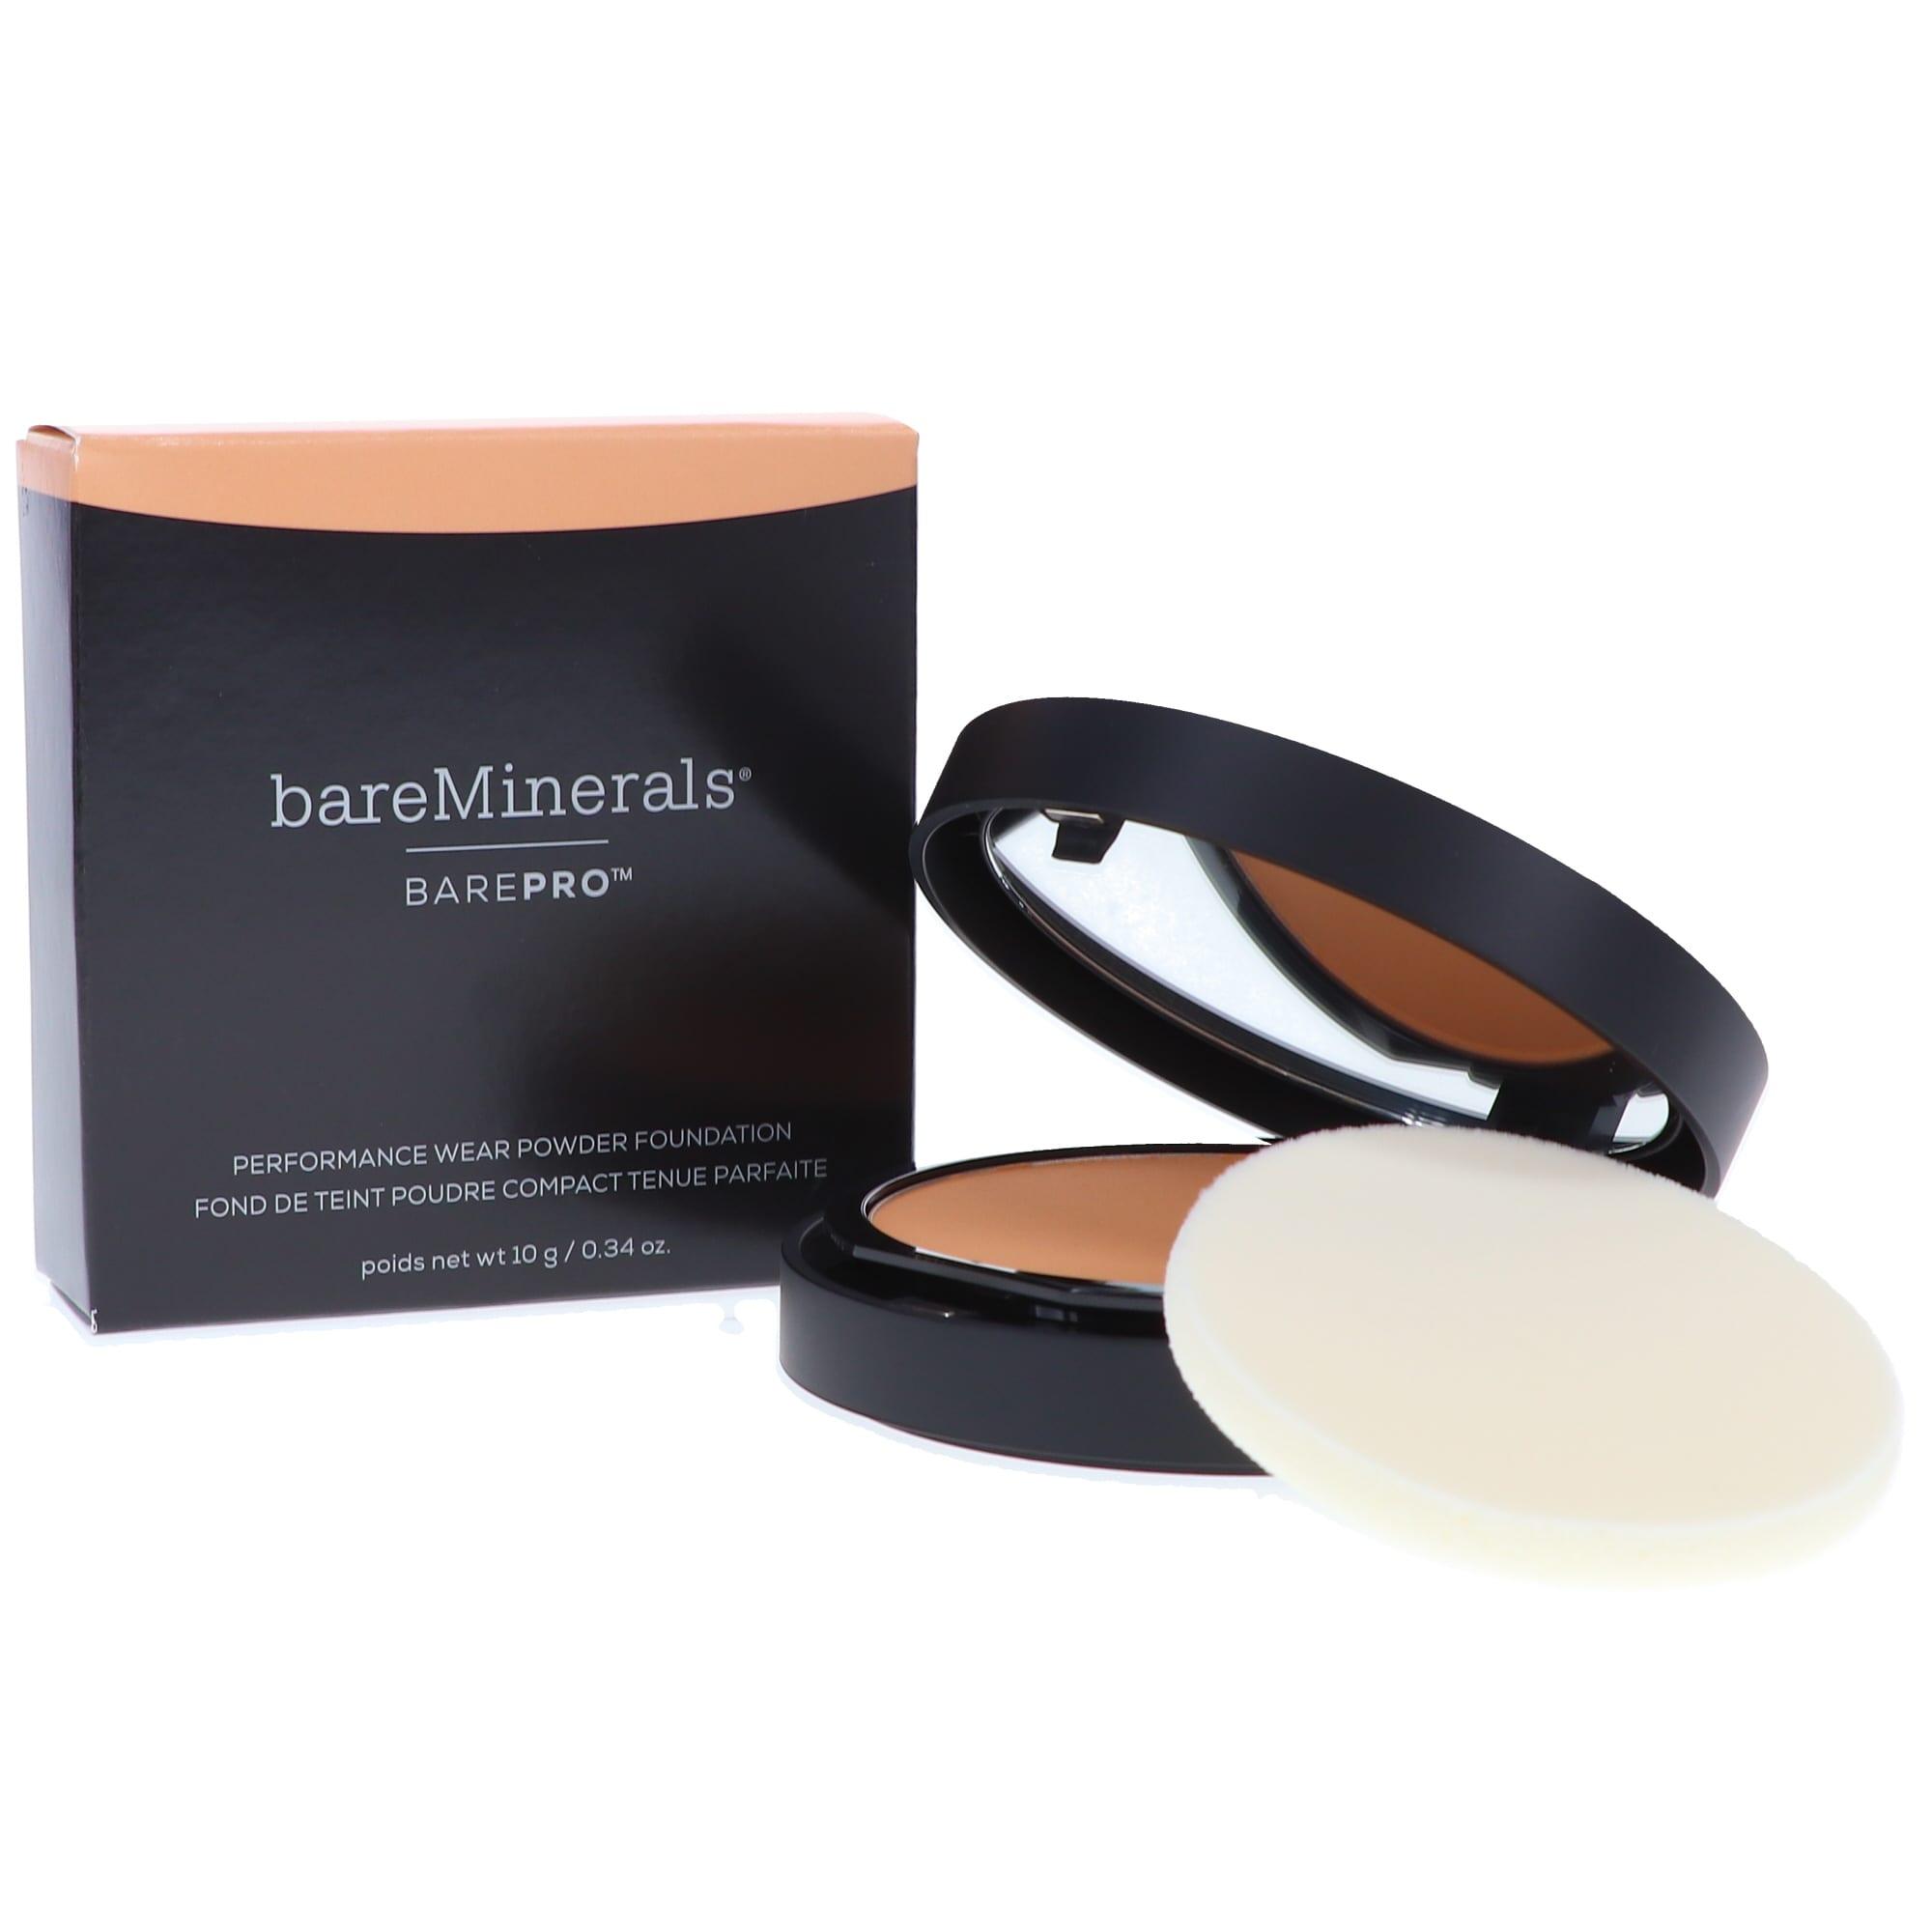 Bareminerals Barepro Performance Wear Powder Foundation Sandstone 0 34 Oz Lala Daisy